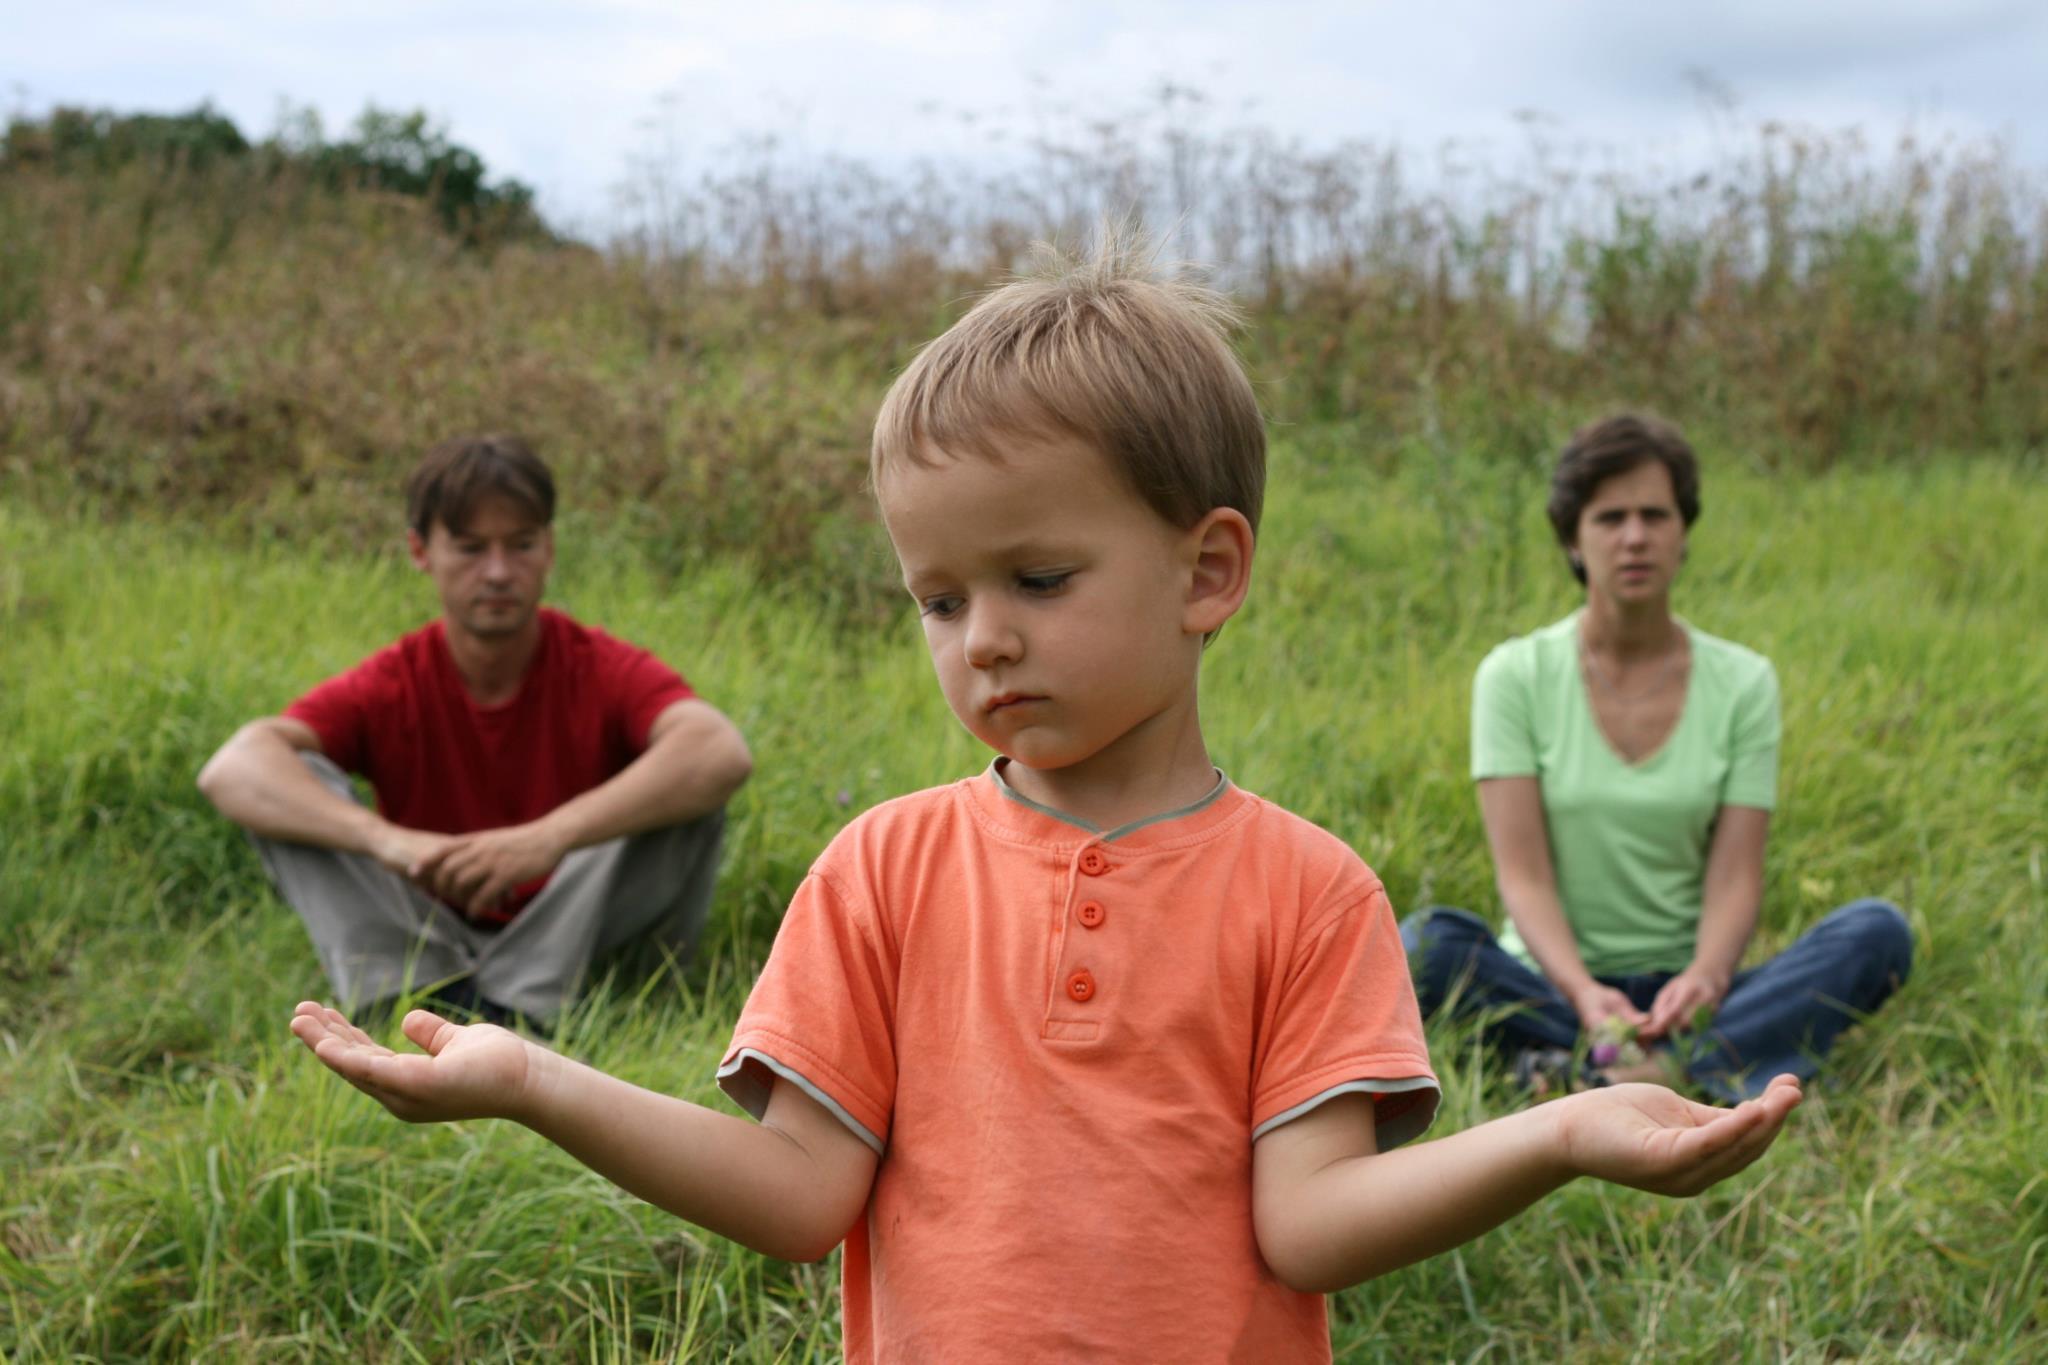 parenting-through-divorce%20%281%29.jpg